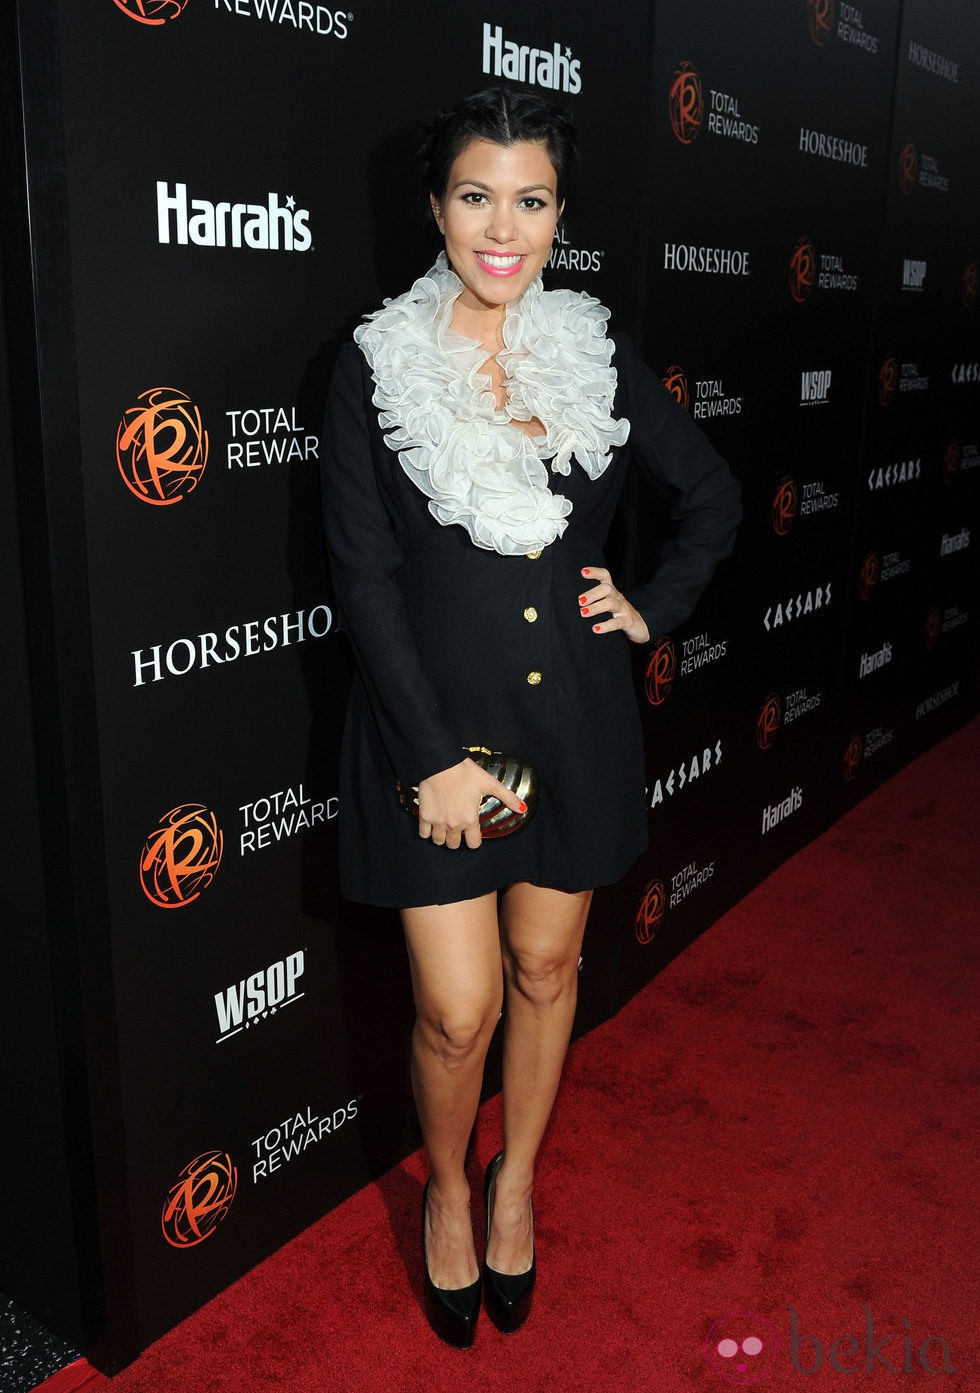 Kourtney Kardashian en Hollywood en el 2012